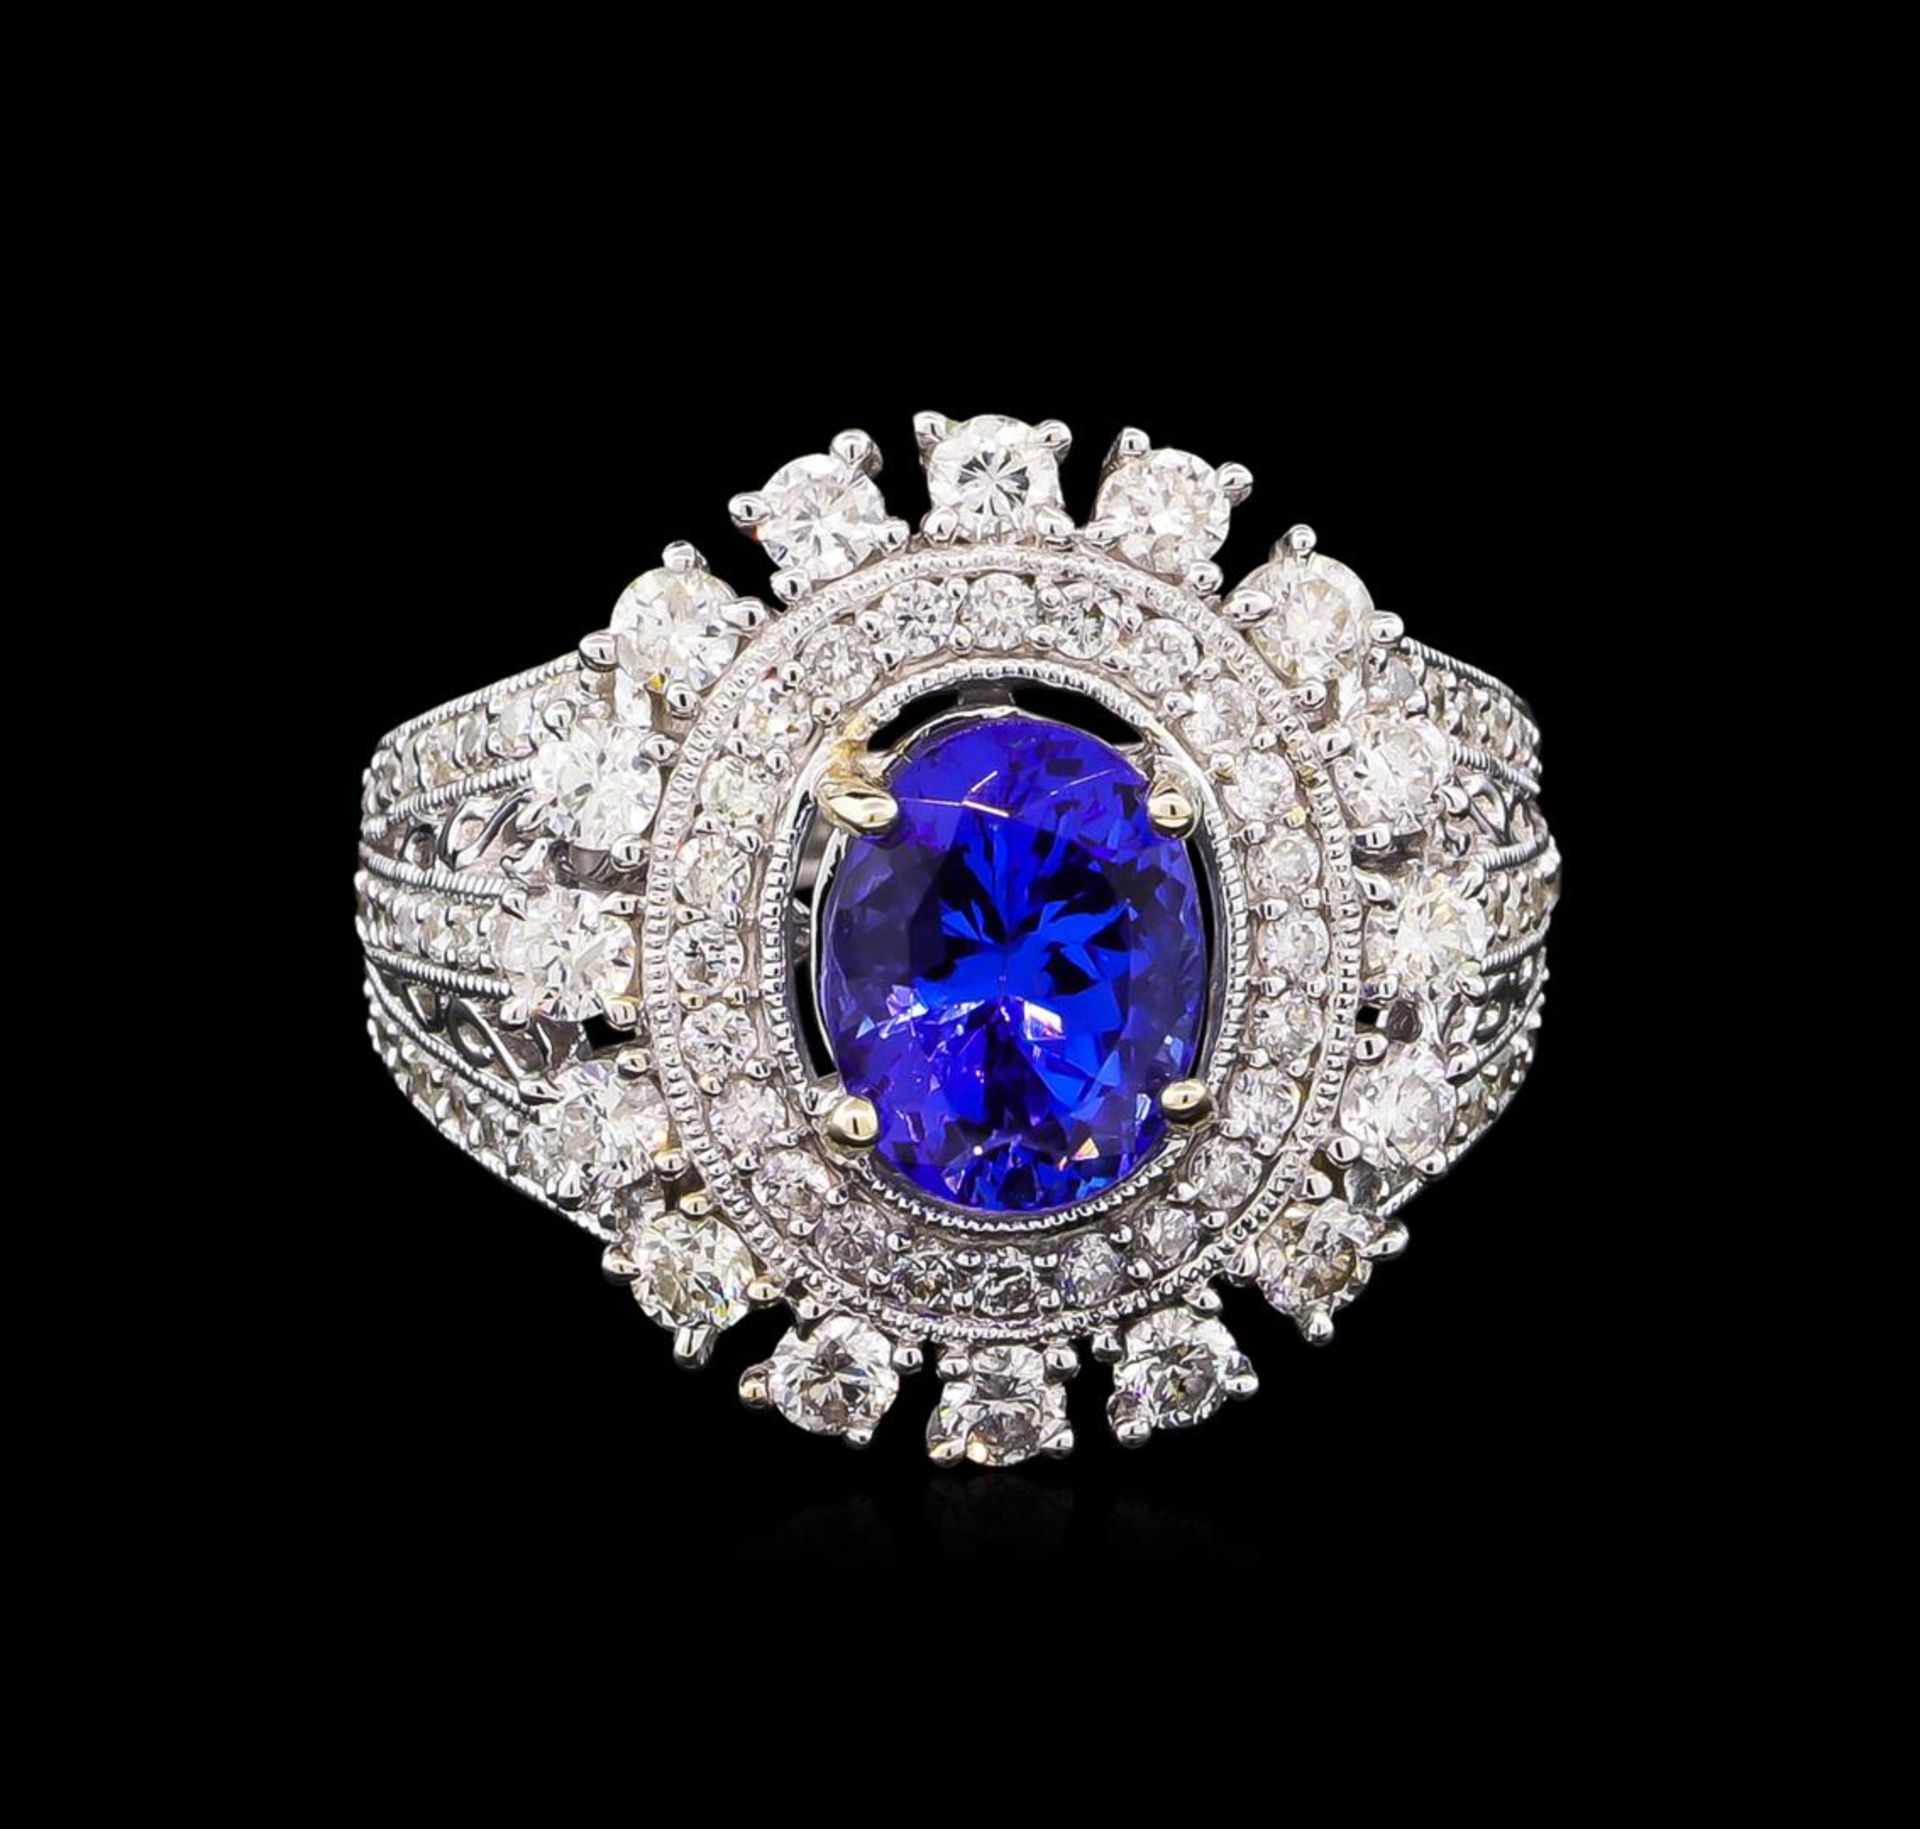 14KT White Gold 2.20 ctw Tanzanite and Diamond Ring - Image 2 of 5